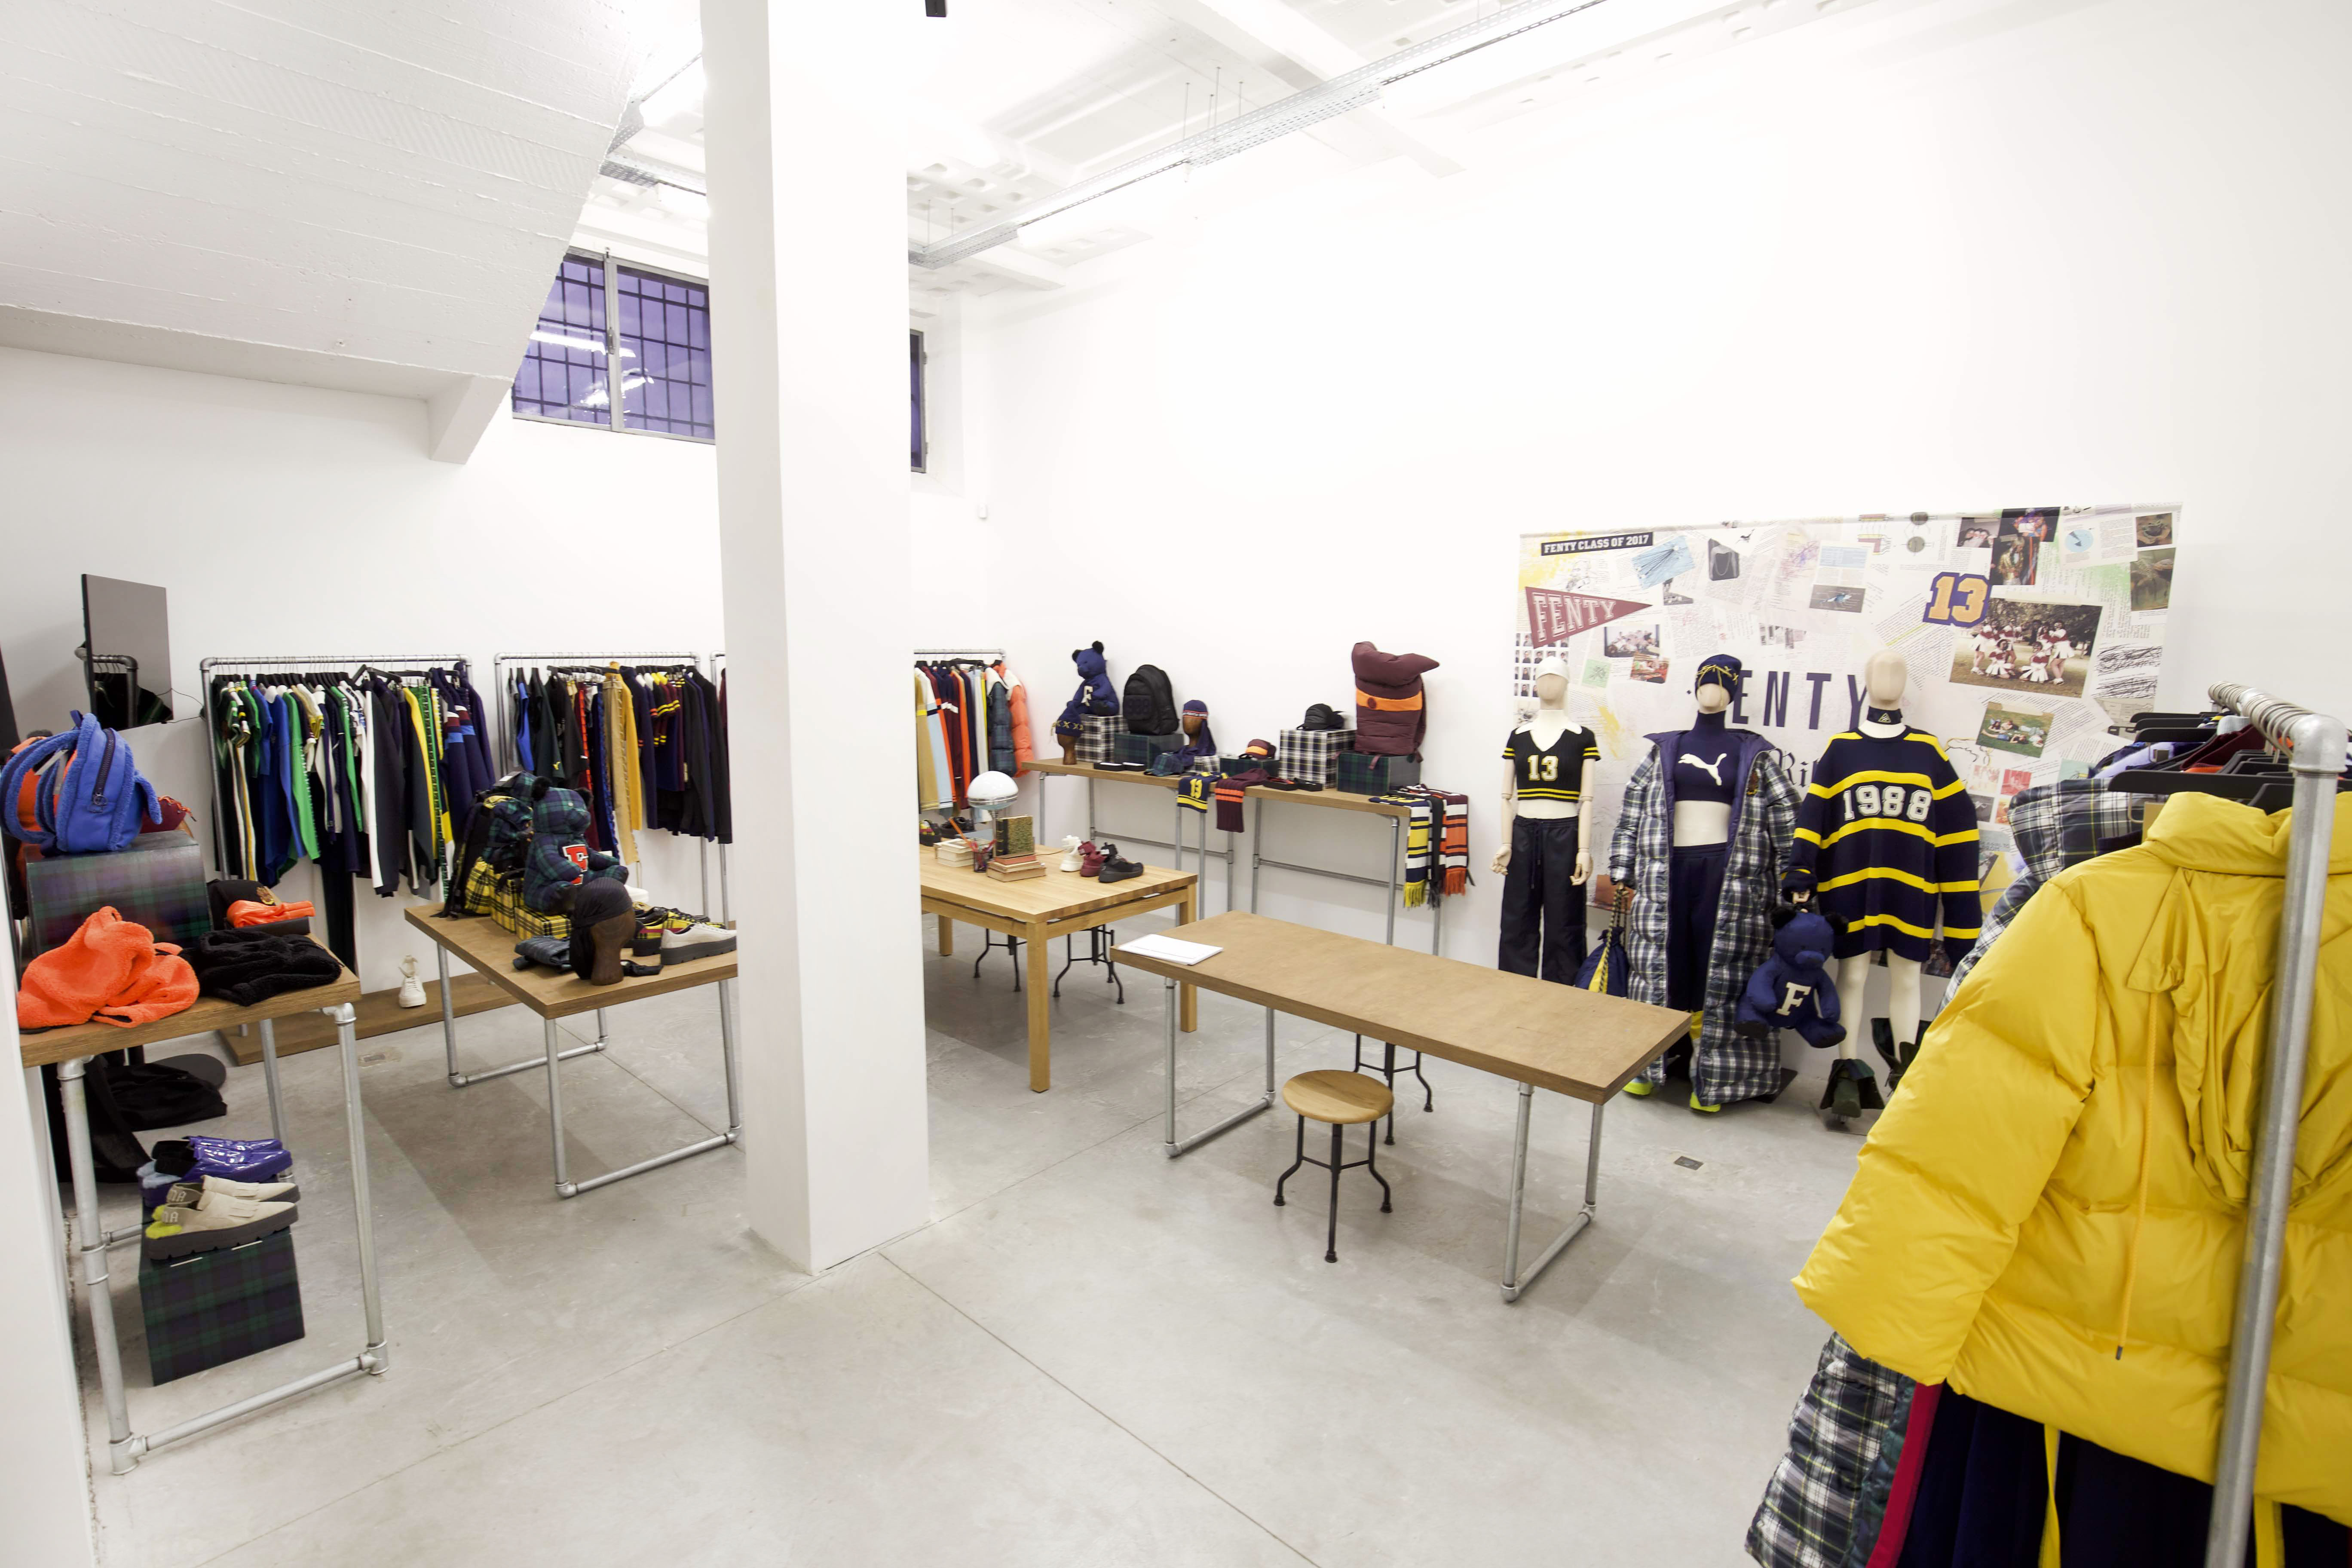 Rihanna Puma Paris Fashion Week Showroom